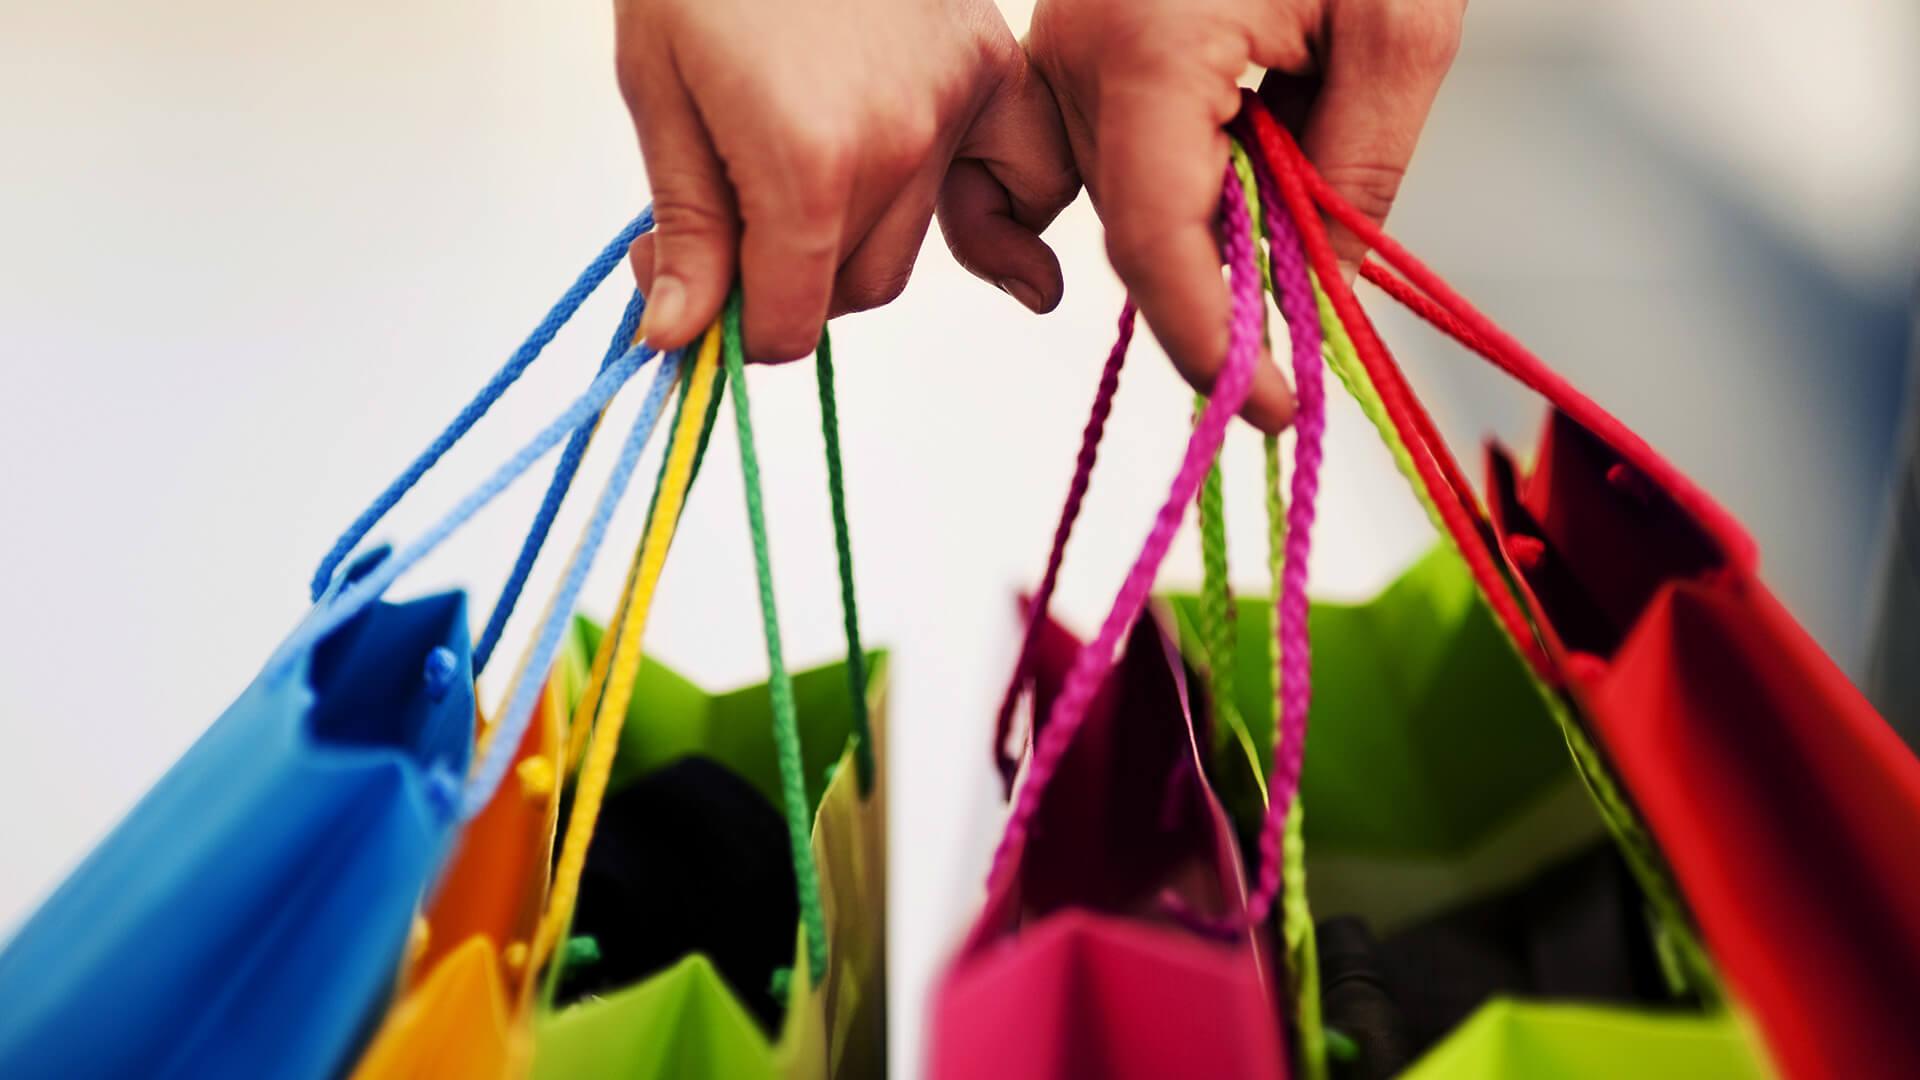 Cómo navegar por los anuncios de catálogo de productos en Shopping esta temporada navideña